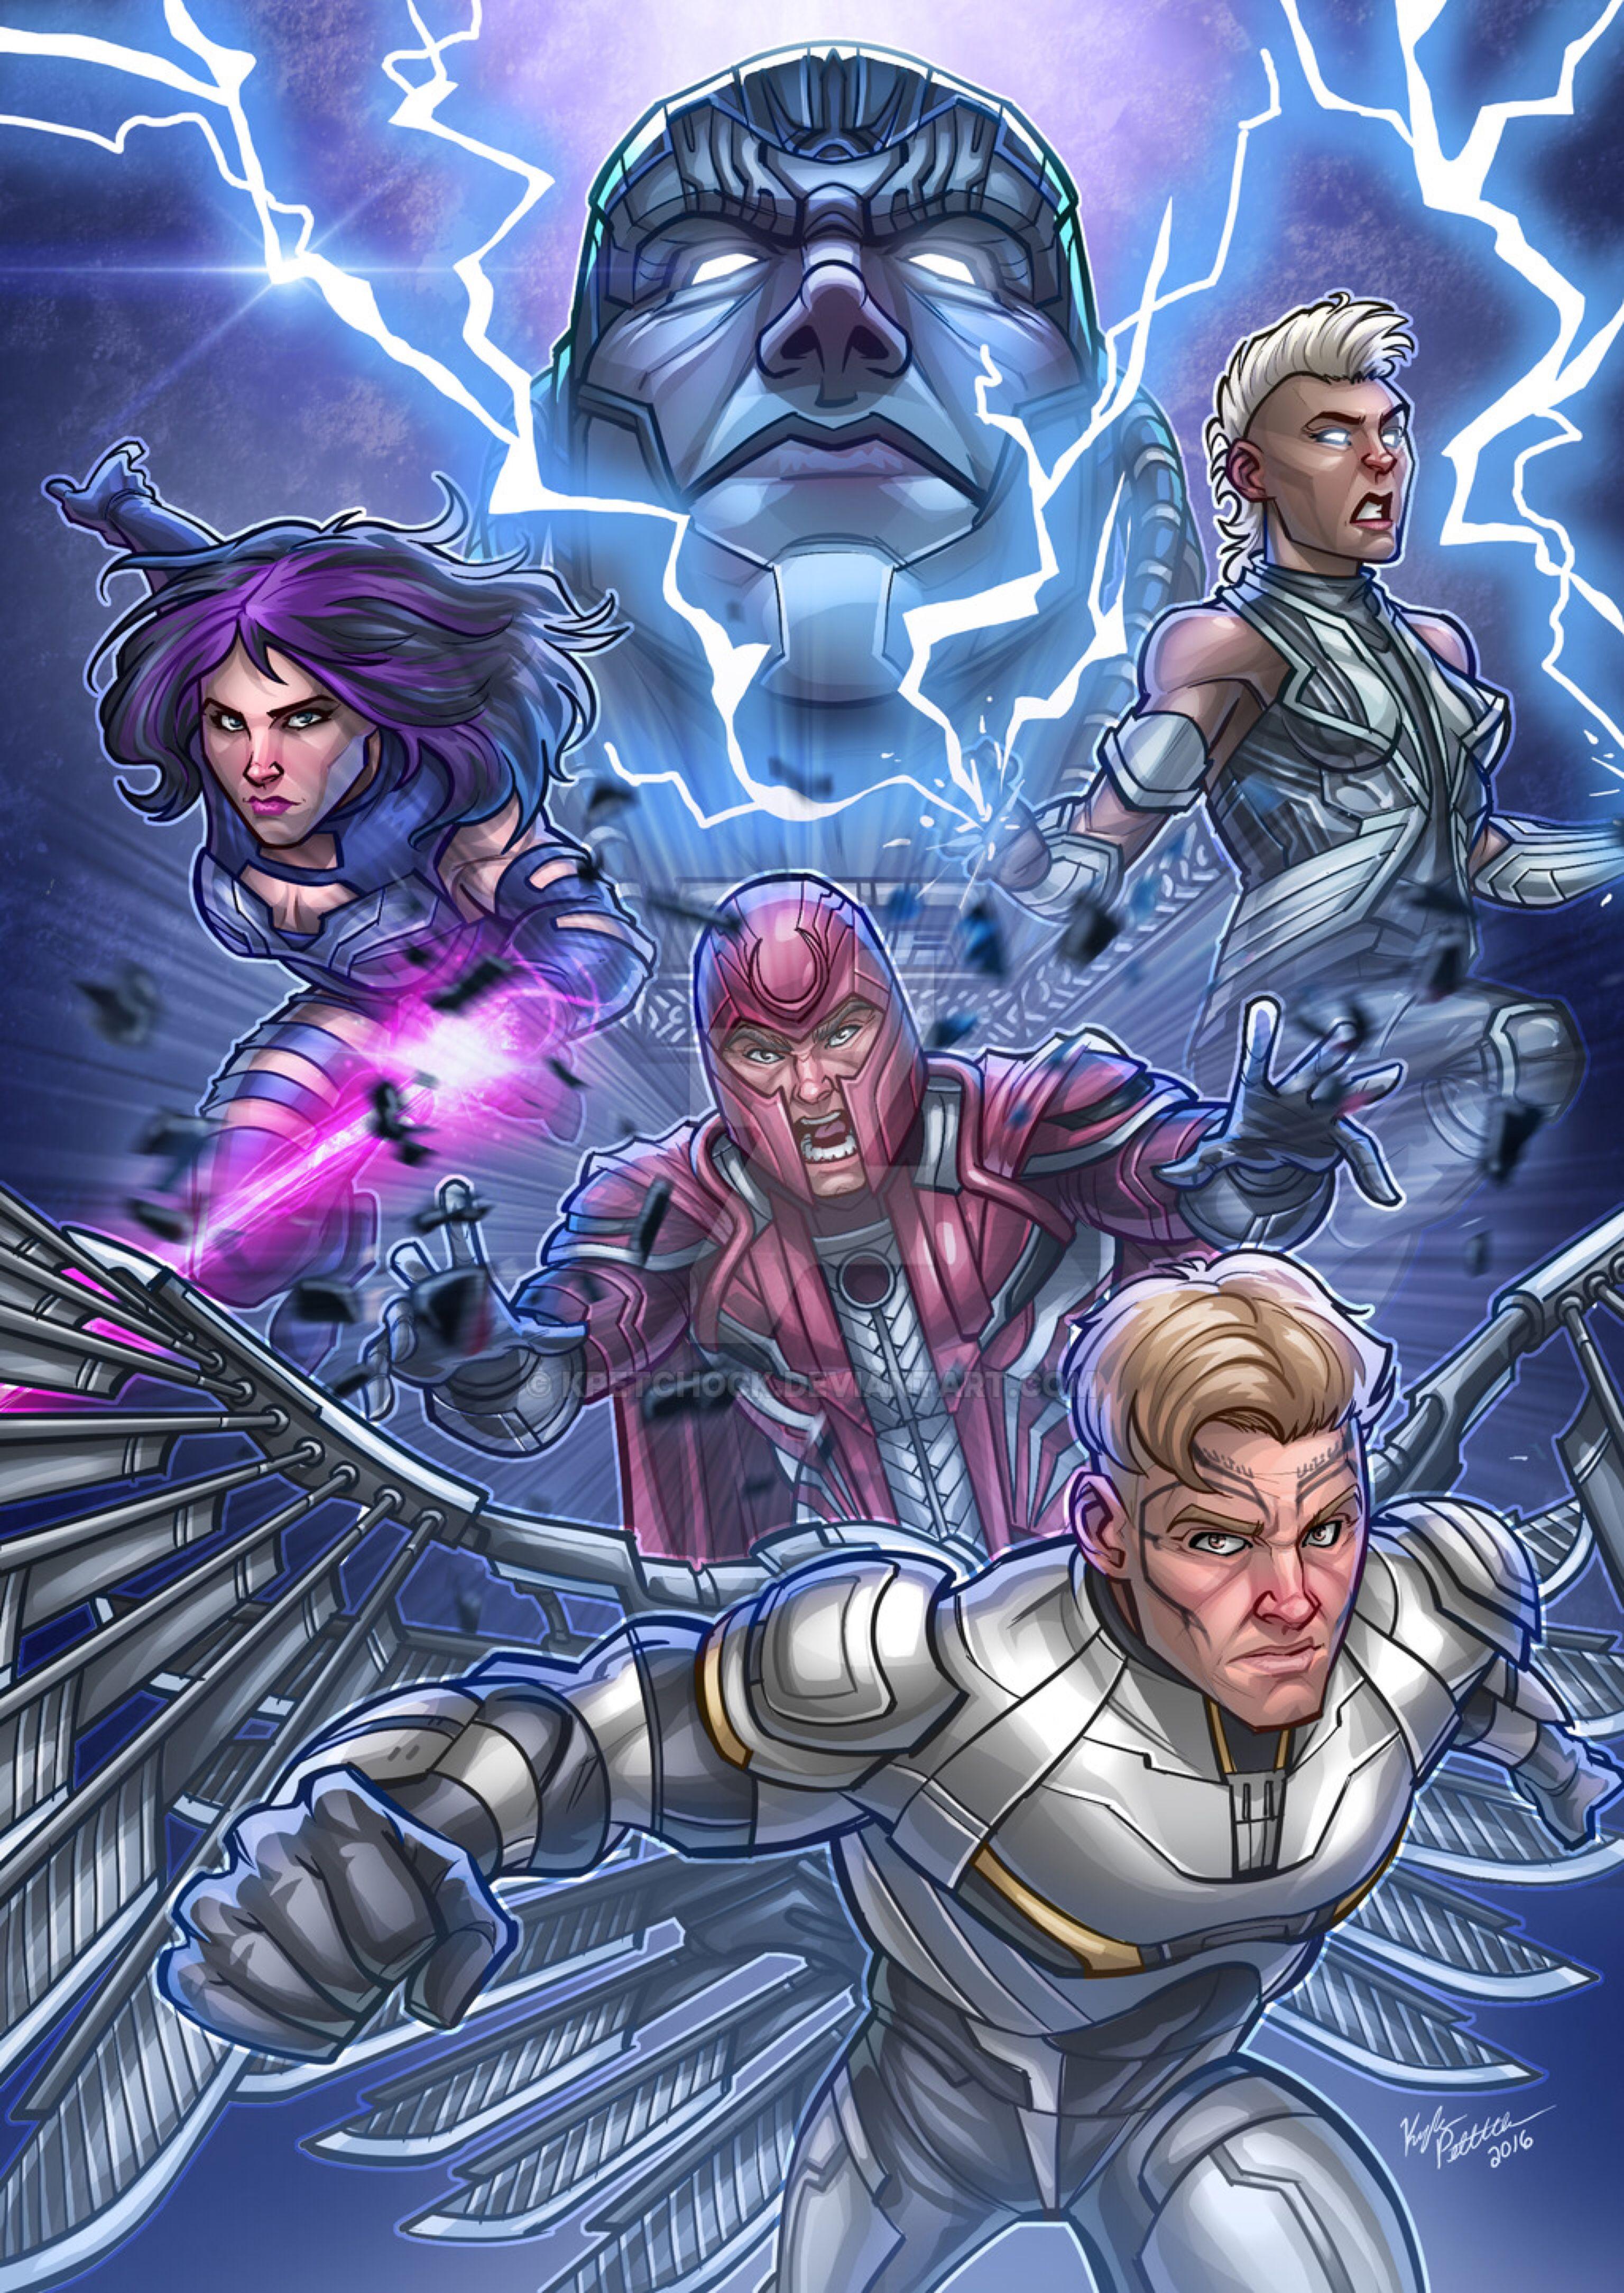 XMen Apocalypse The Four Horsemen Apocalypse marvel